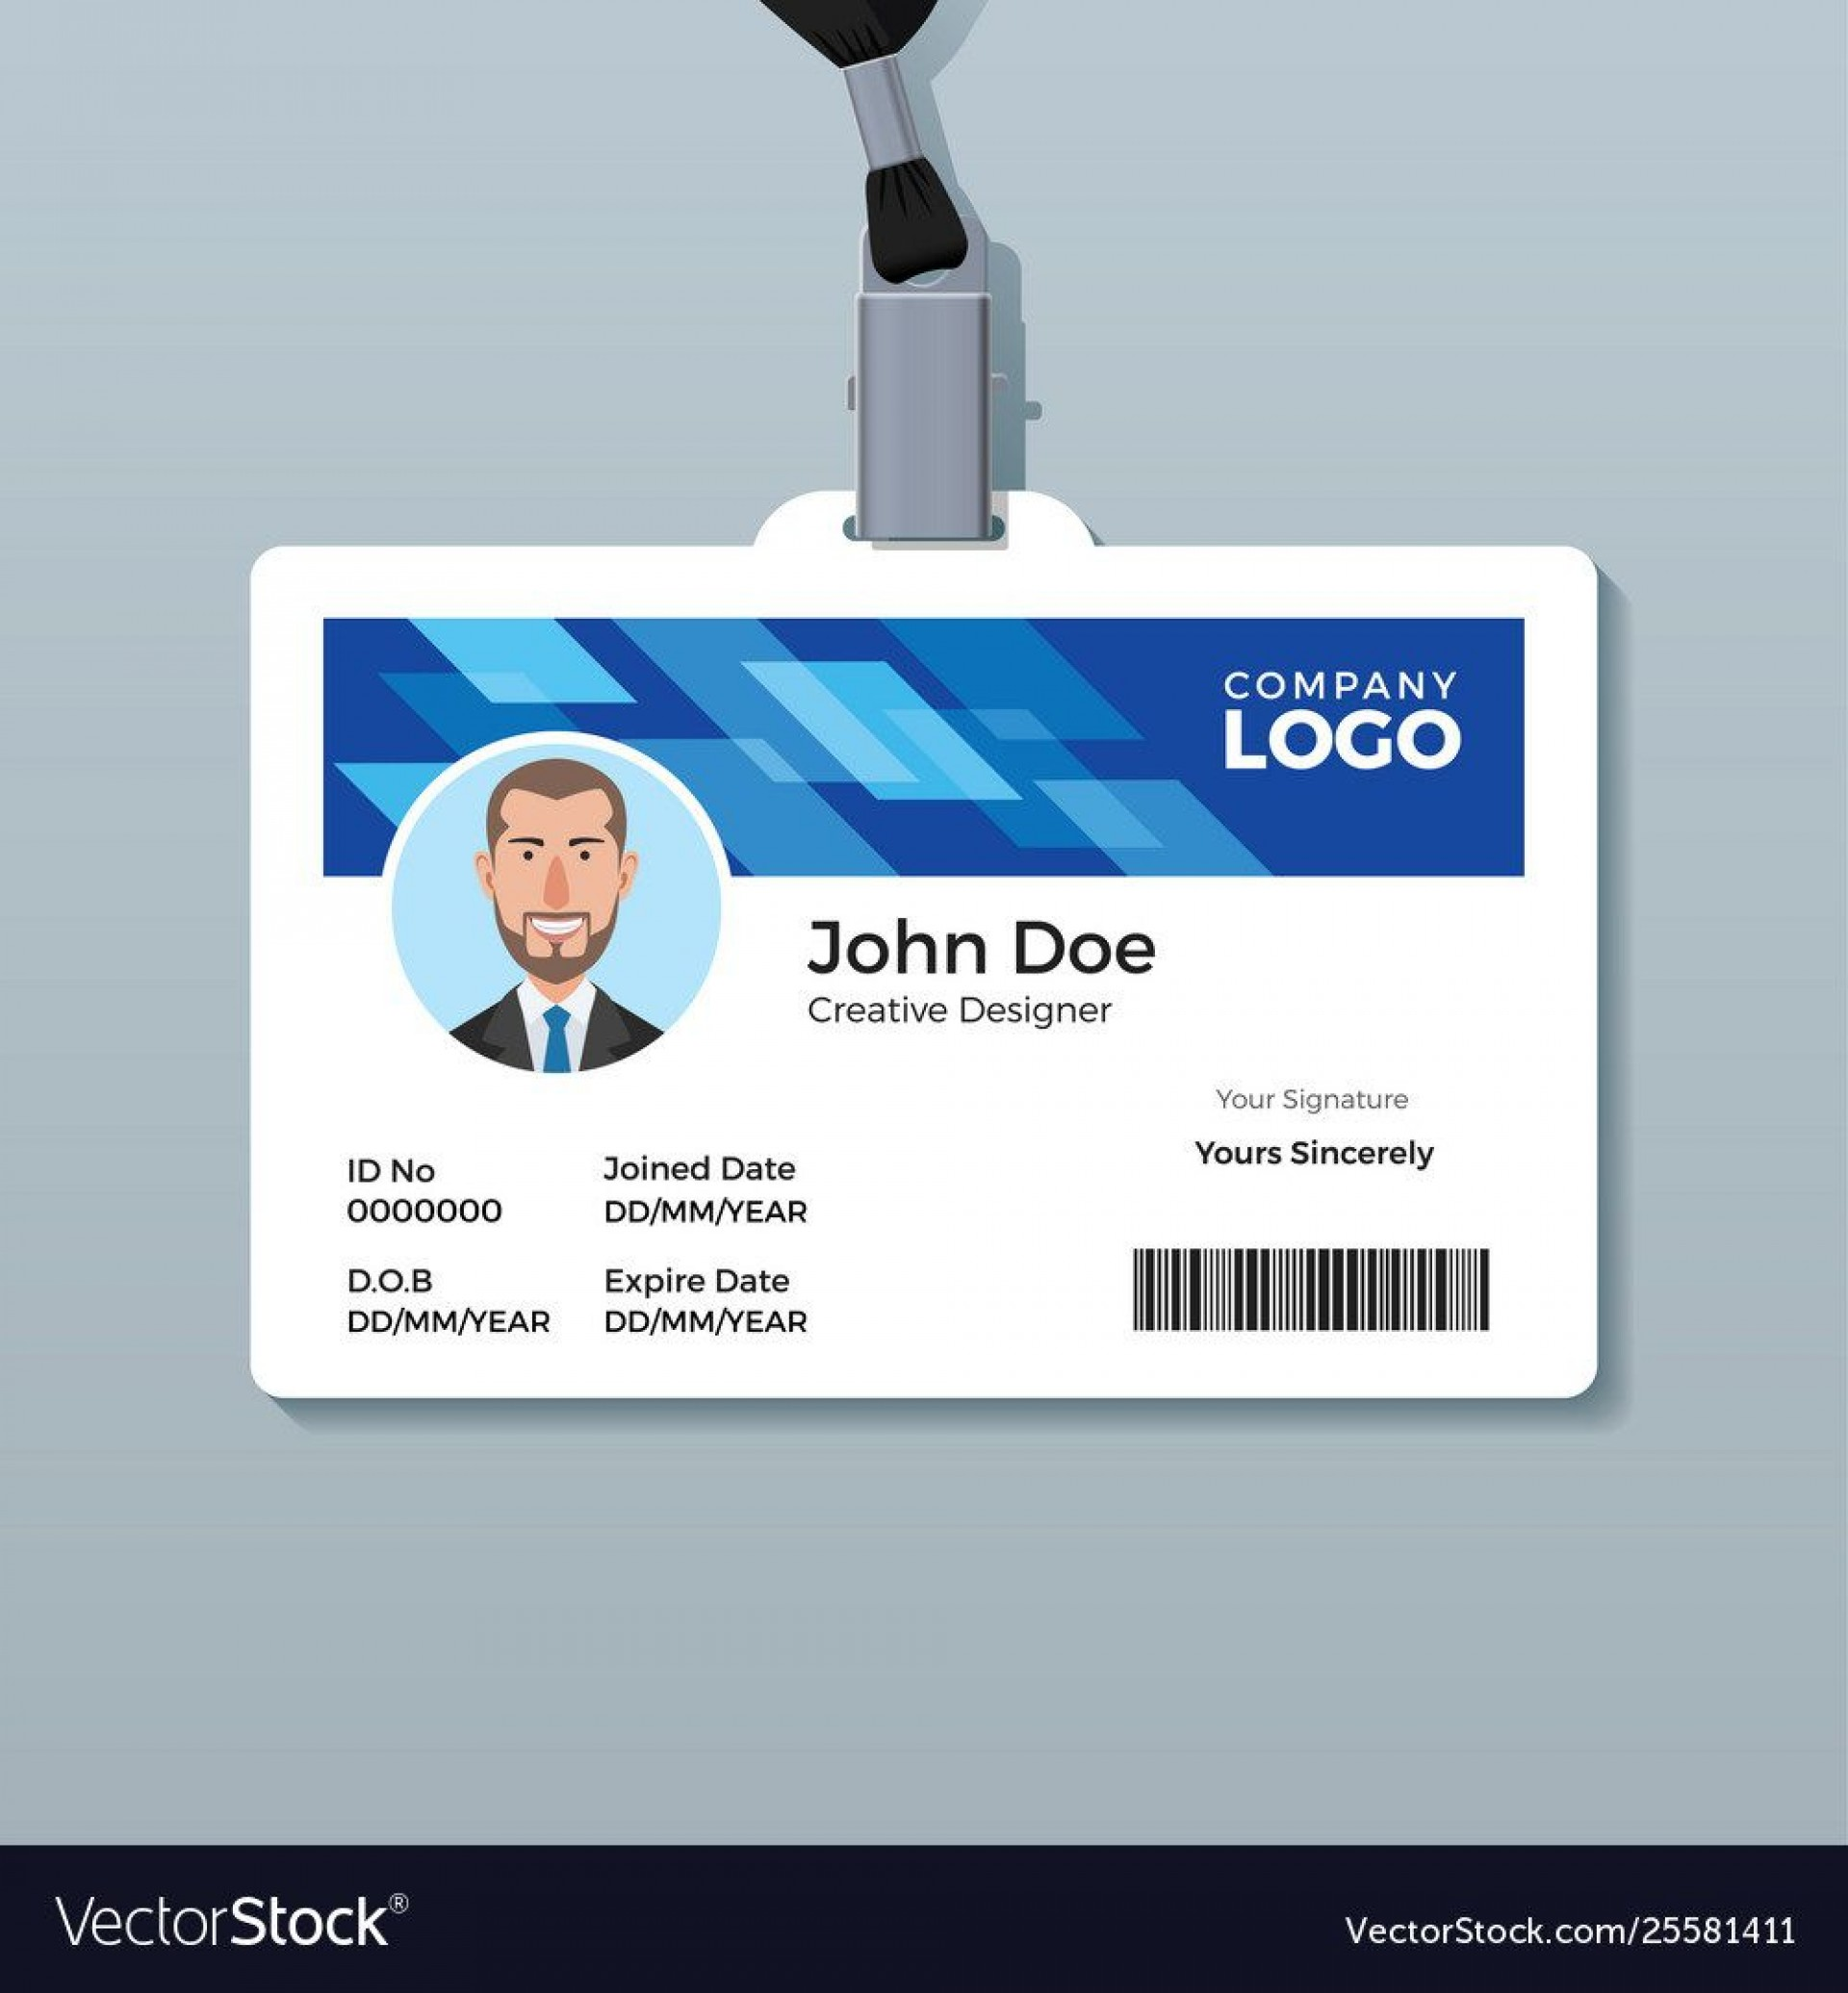 005 Formidable Id Badge Template Free Picture  School Teacher Jurassic Park1920